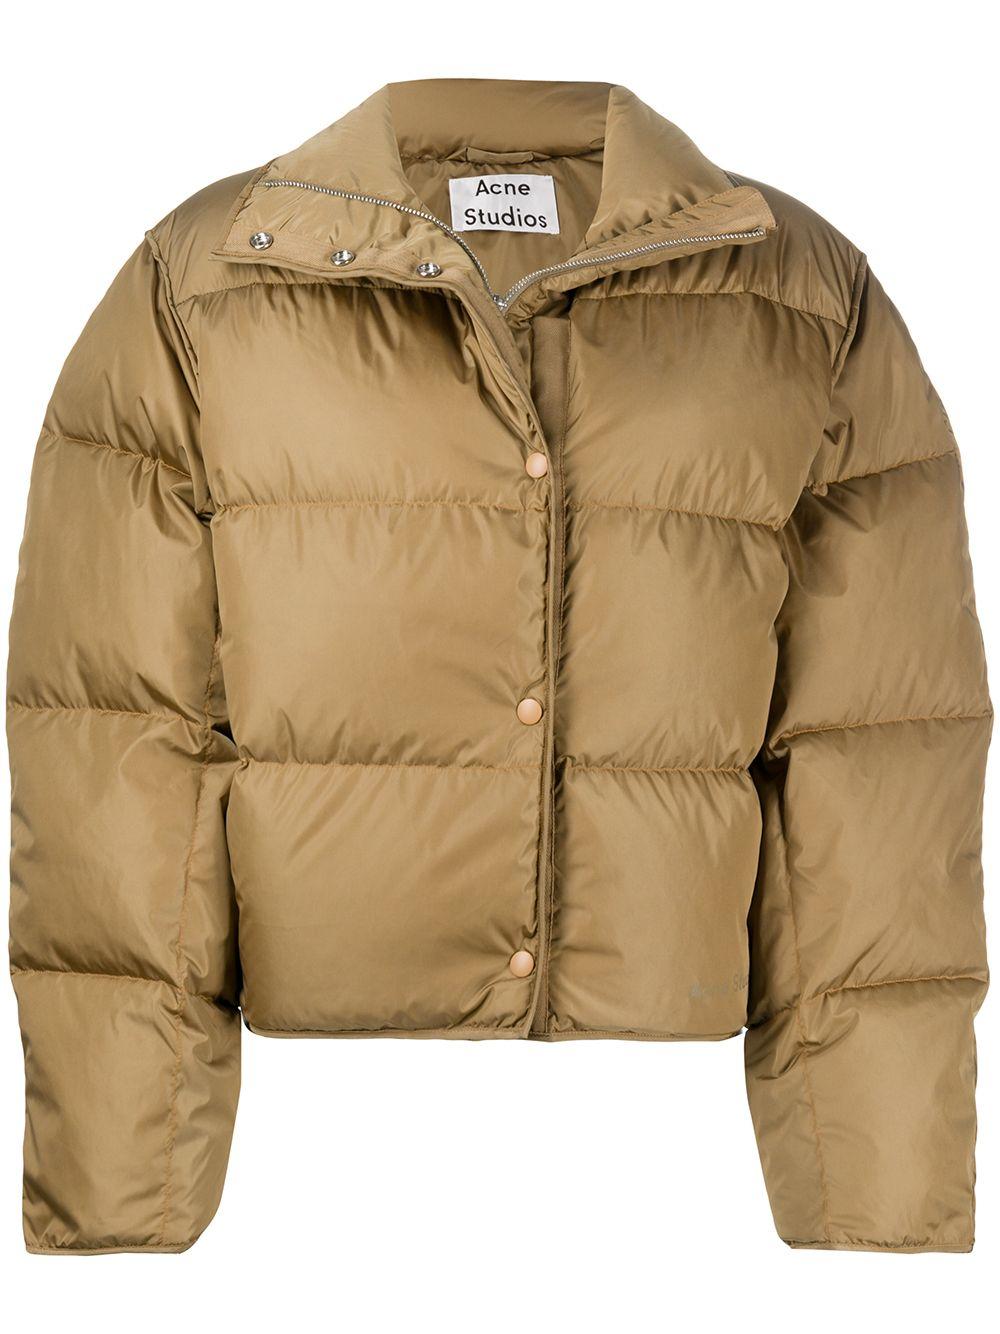 Acne Studios Short Puffer Jacket Farfetch [ 1334 x 1000 Pixel ]